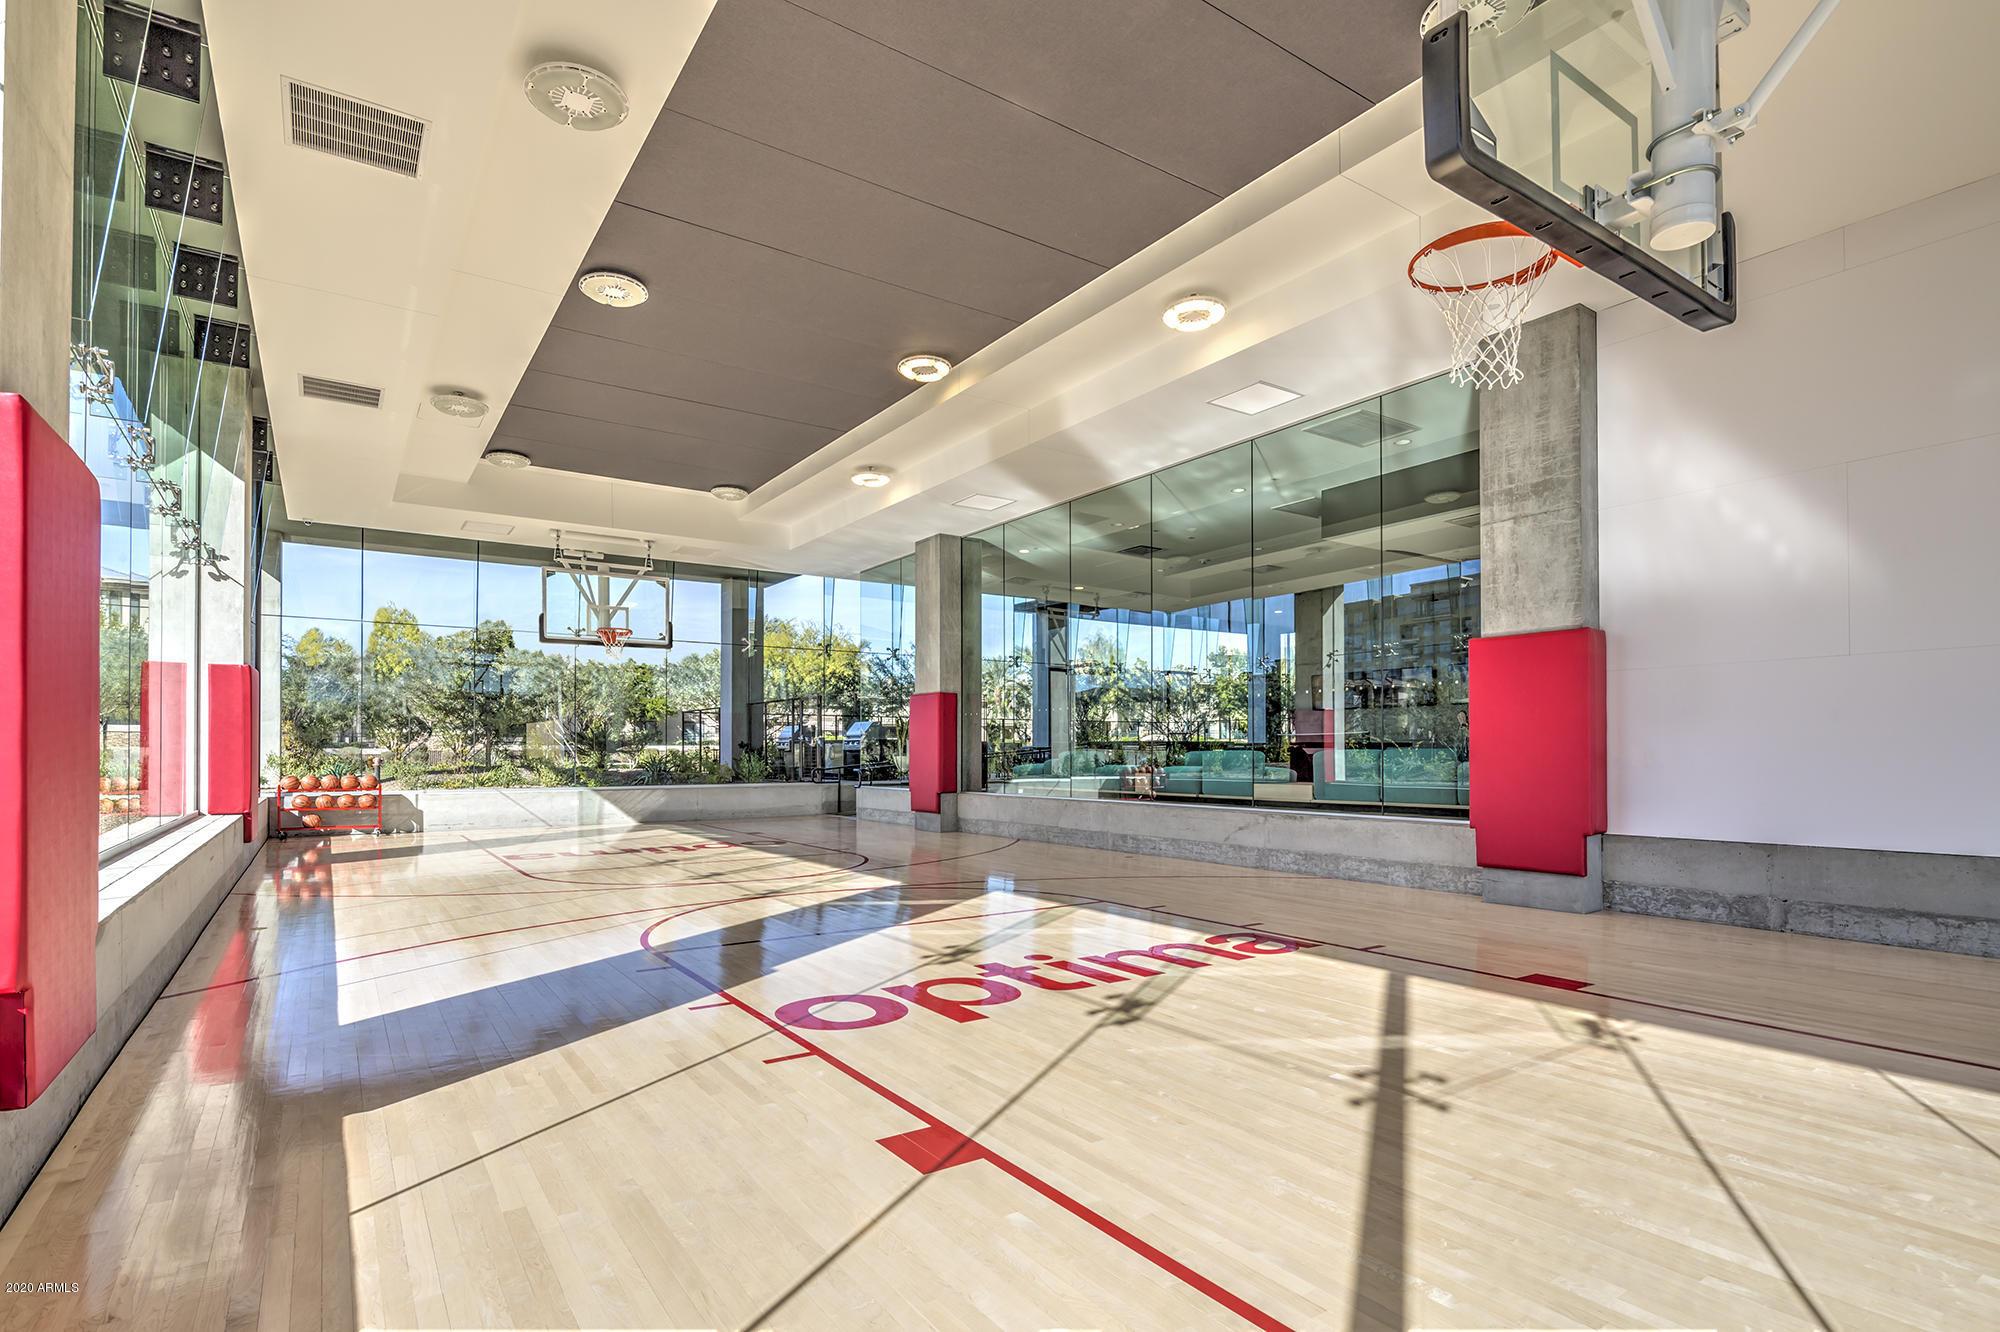 7180 KIERLAND Boulevard, Scottsdale, Arizona 85254, 1 Bedroom Bedrooms, ,1 BathroomBathrooms,Residential,For Sale,KIERLAND,6093597